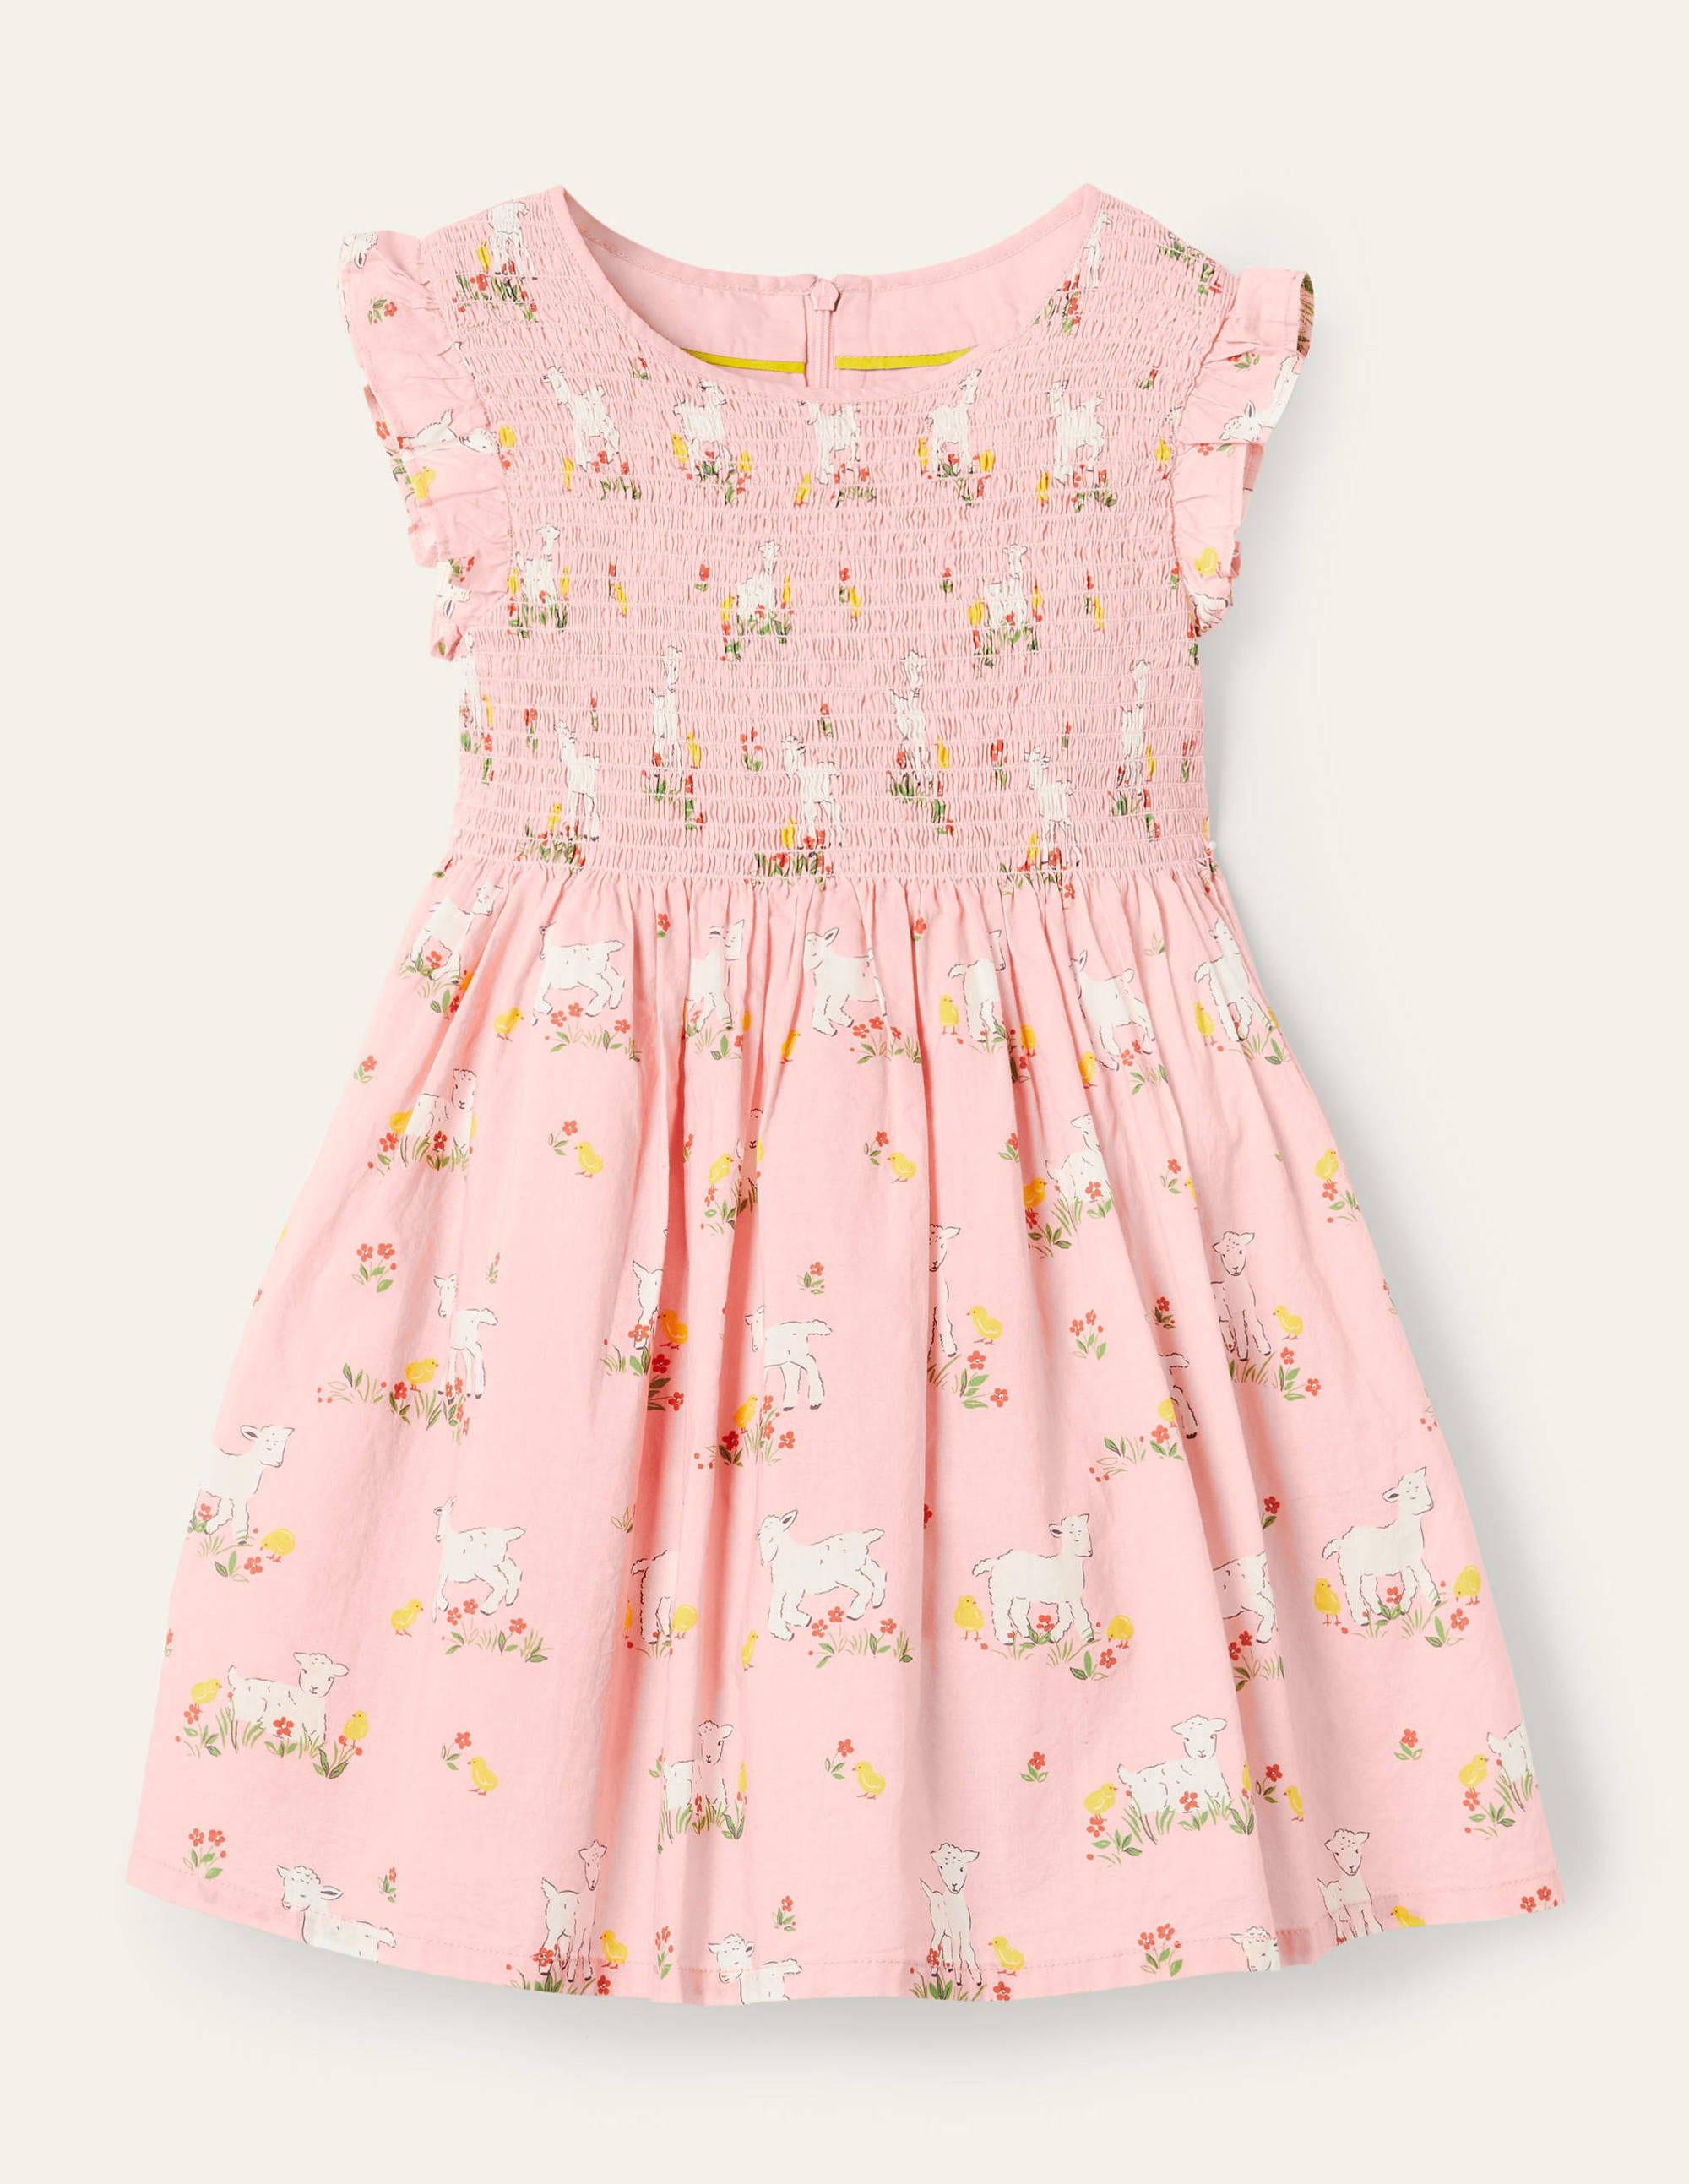 Boden Smocked Woven Dress - Boto Pink Lambs